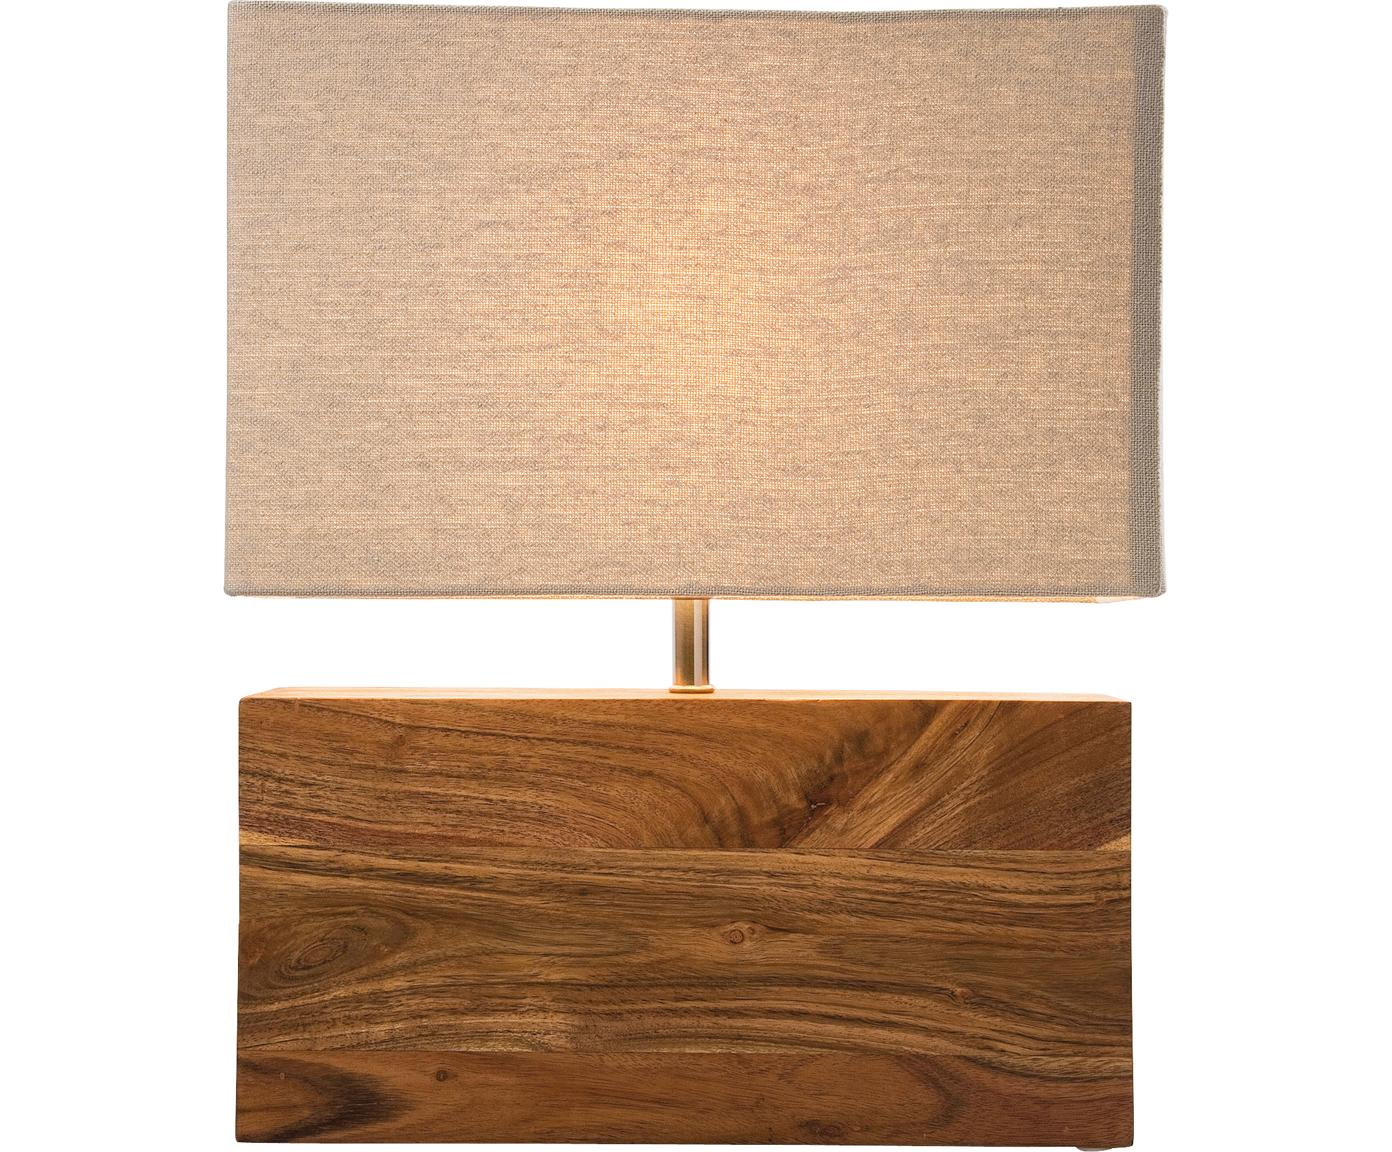 Lampada da tavolo in legno di acacia Rectangular, Legno d'acacia, acciaio, cotone, Legno di quercia, Larg. 33 x Alt. 43 cm